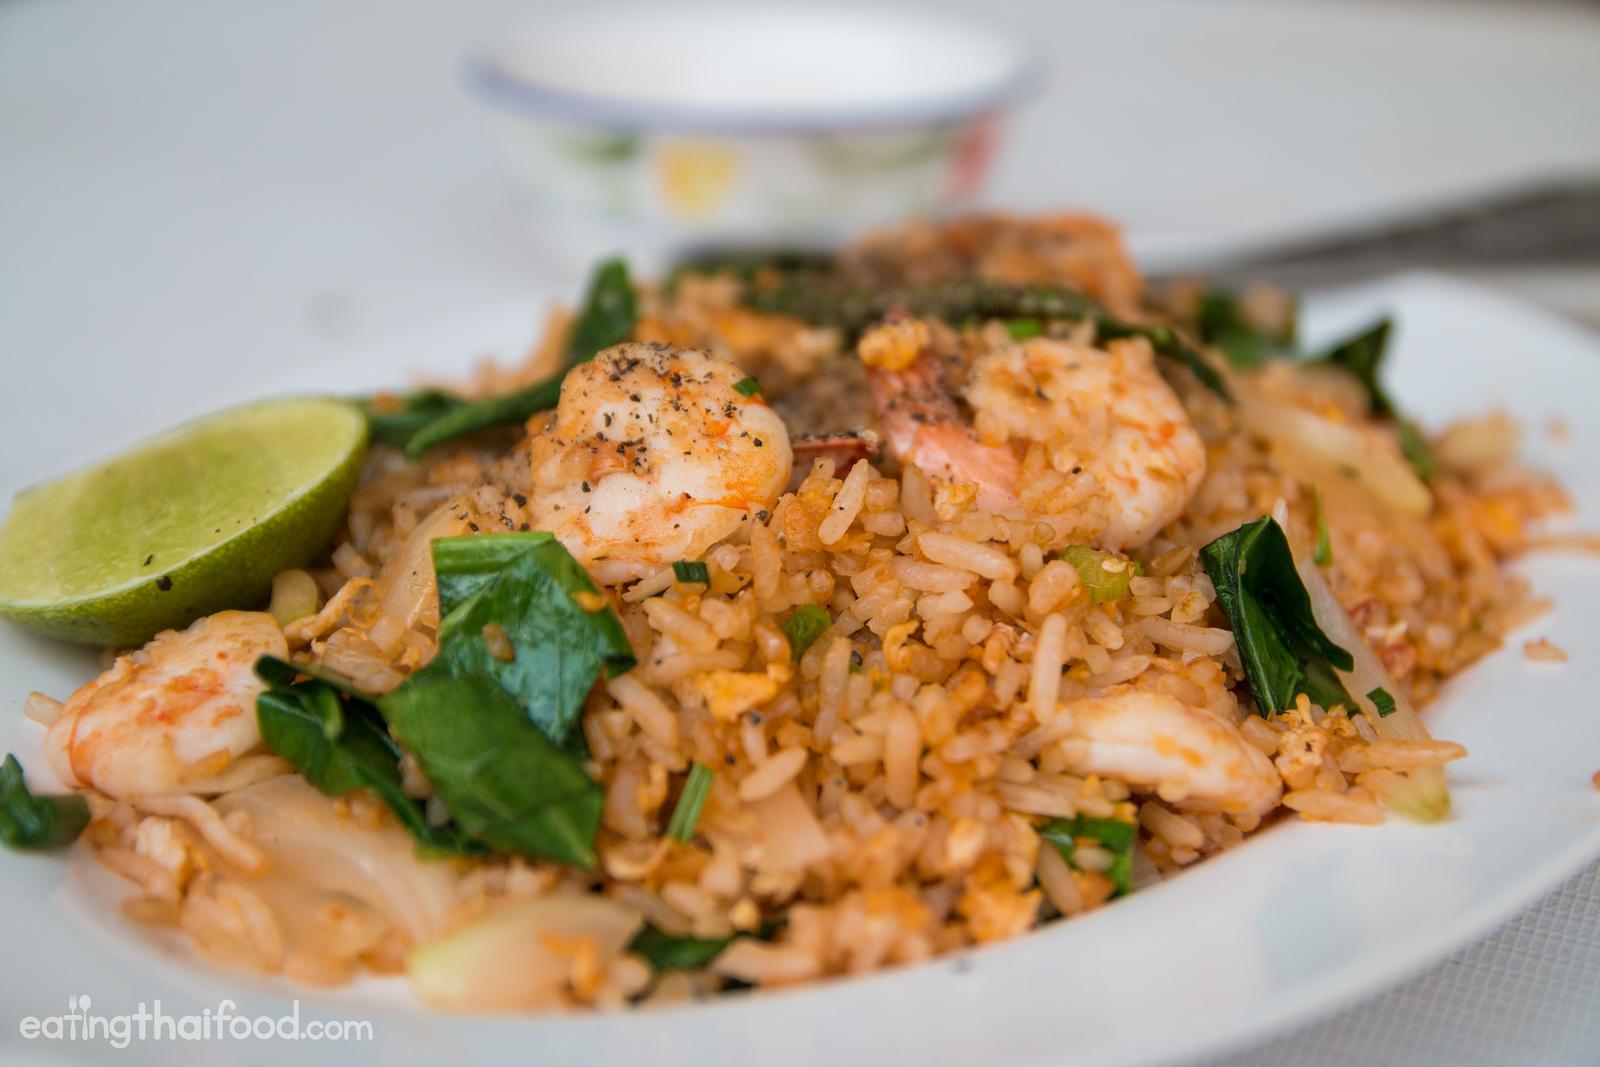 Authentic thai fried rice recipe street food style thai fried rice recipe ccuart Image collections